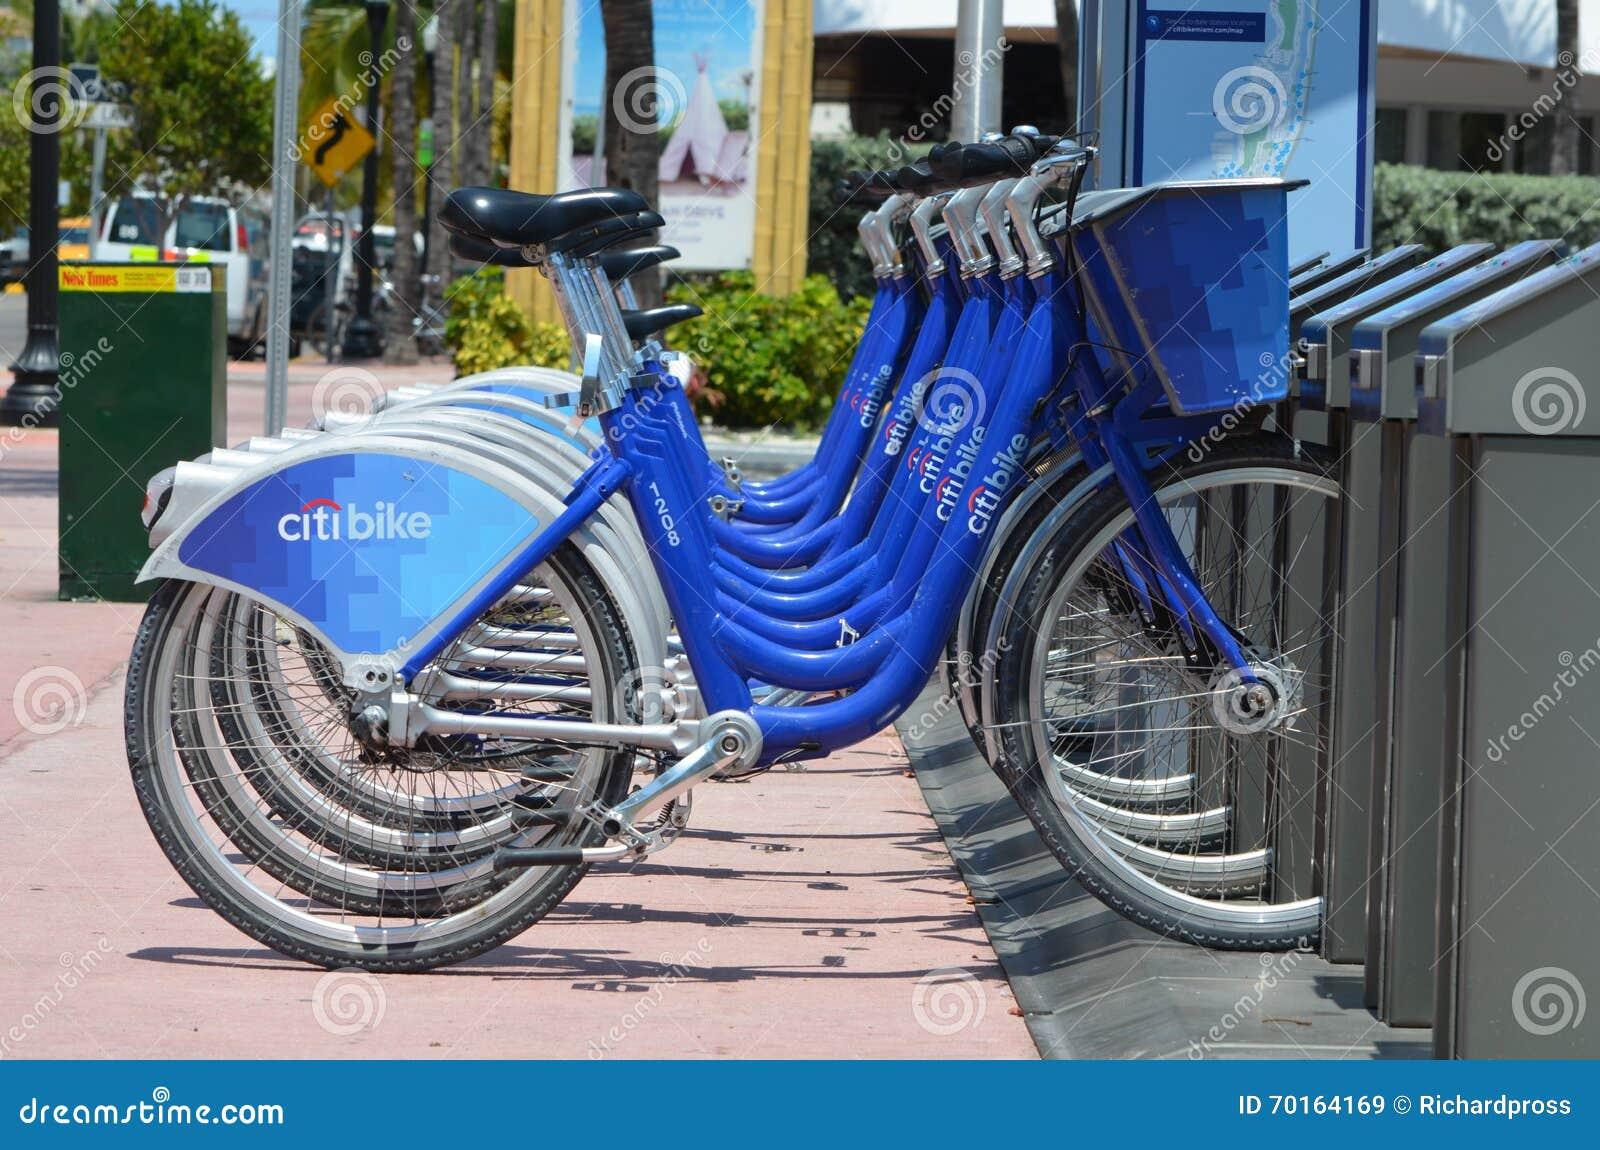 Miami Beach Bike Rental Locations